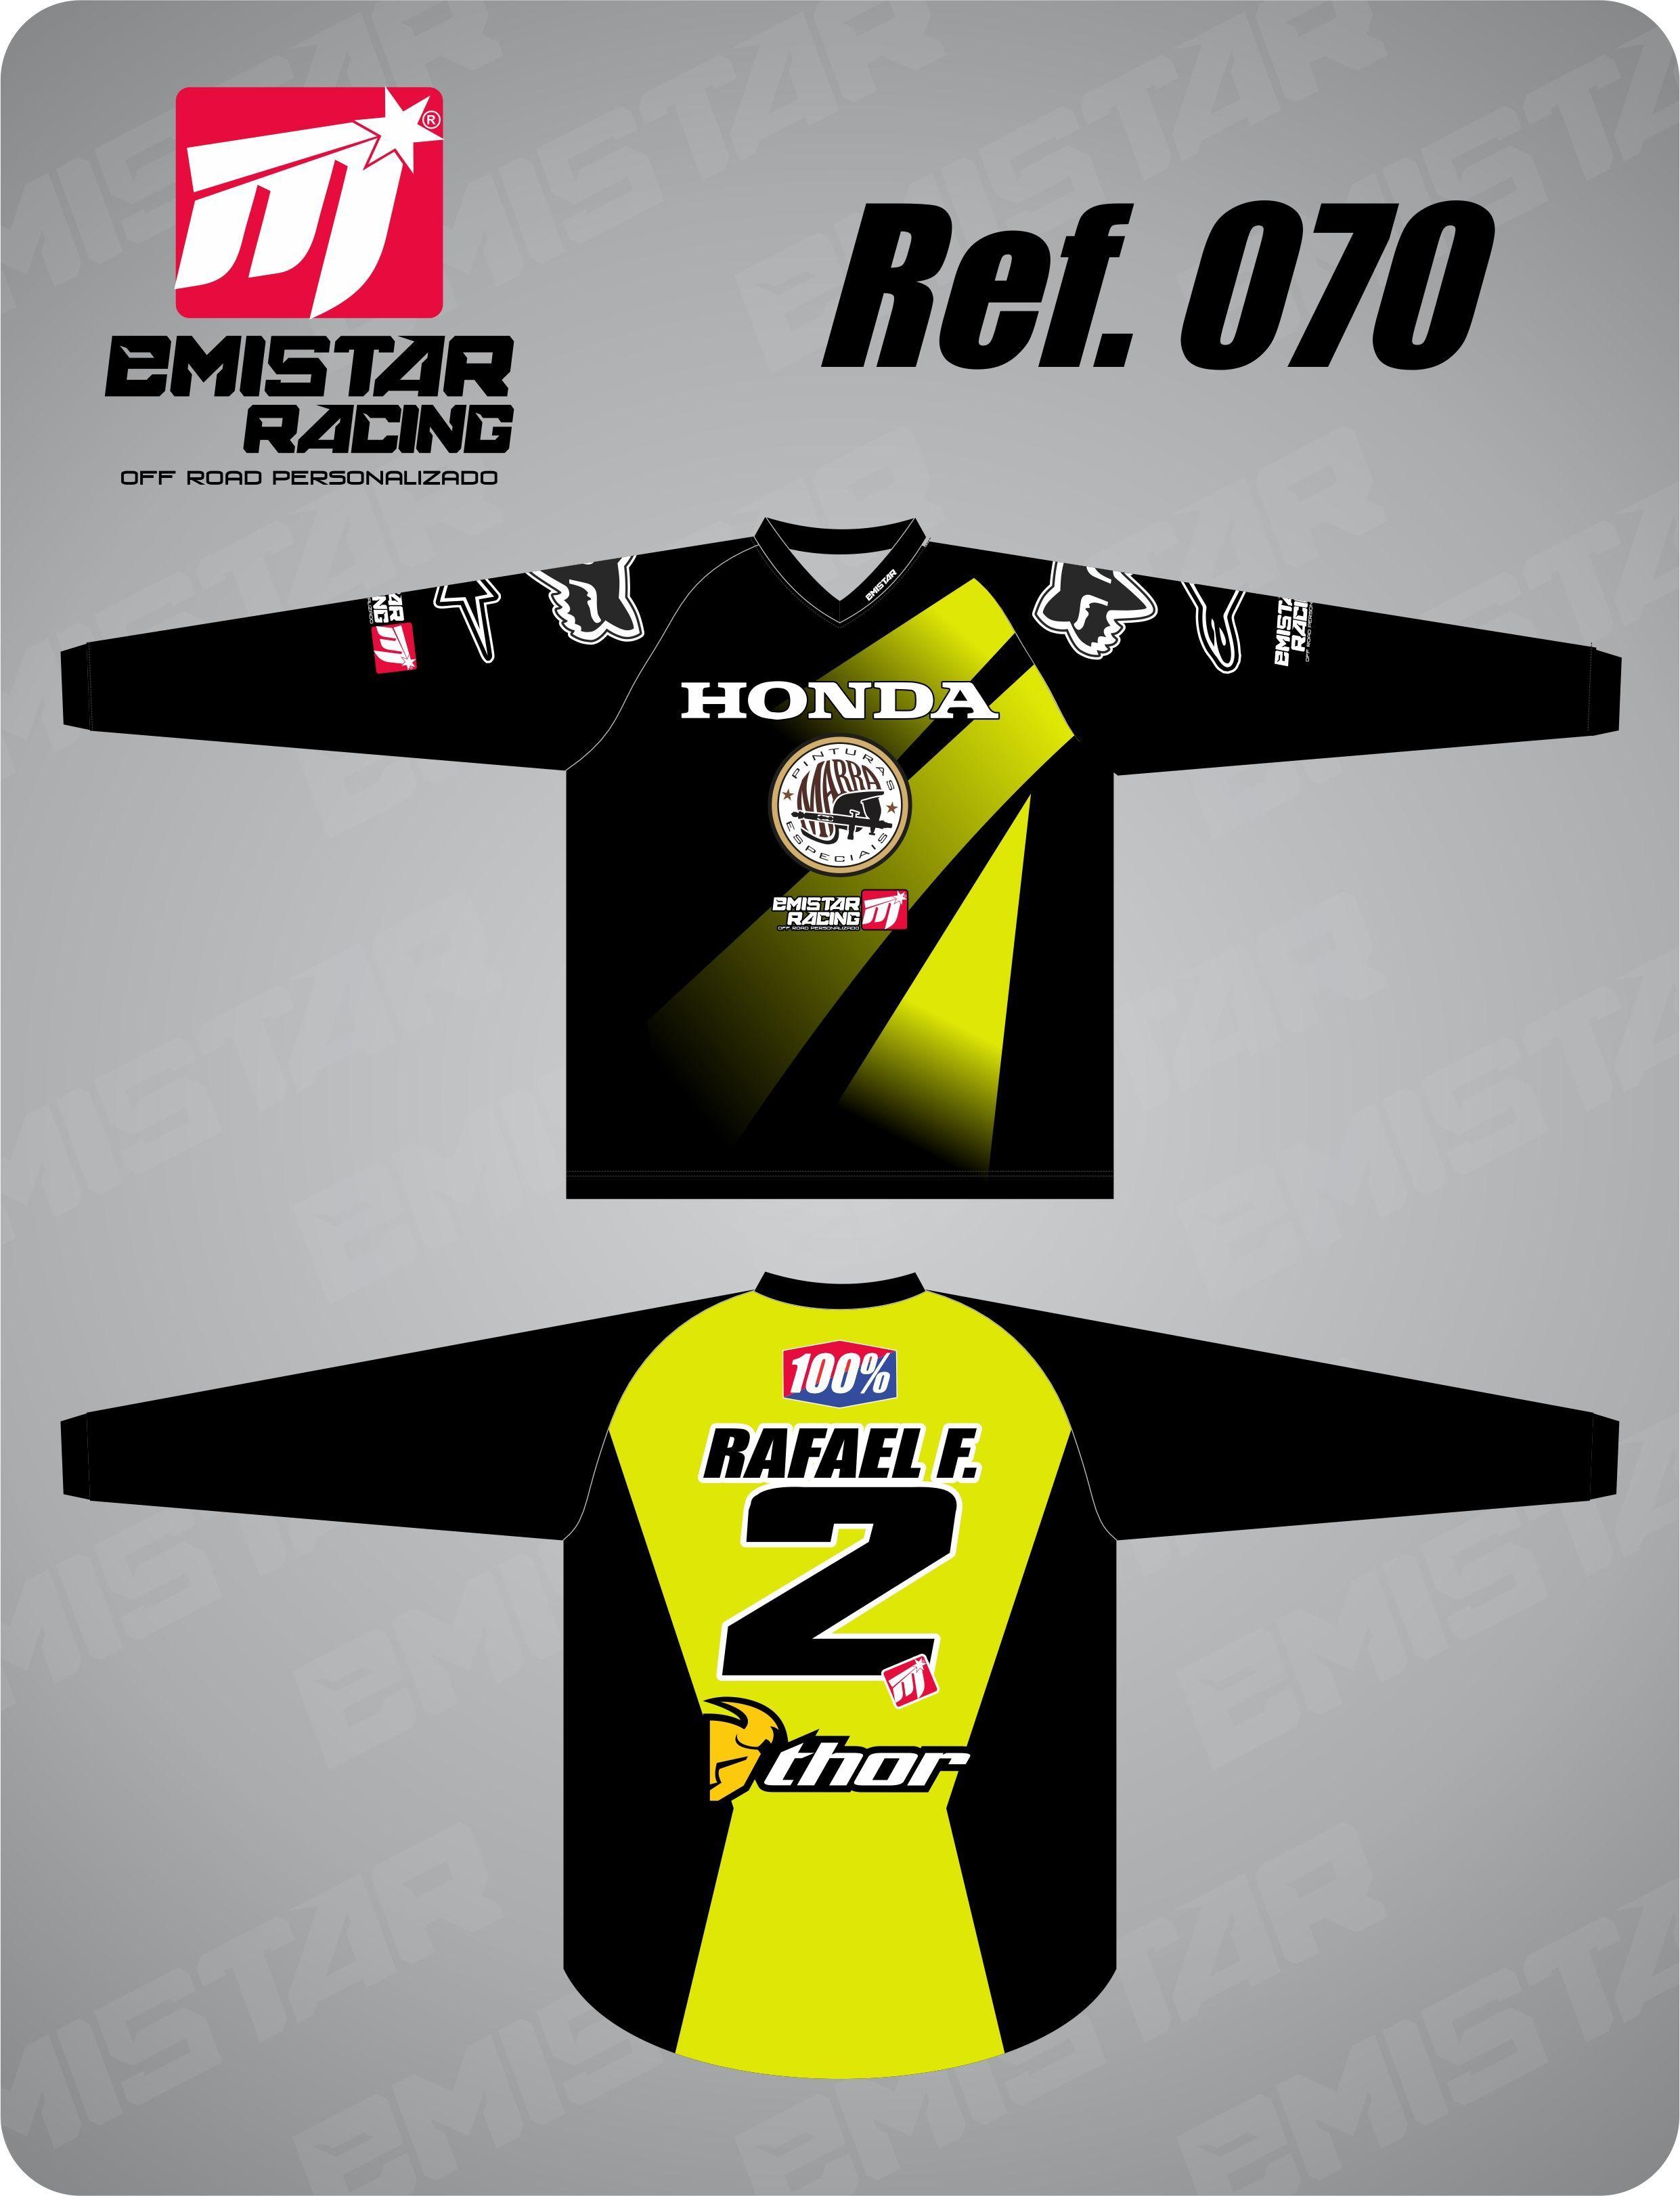 d97d55bdde Camisa personalizada com nome e numeral.. Moto Enduro